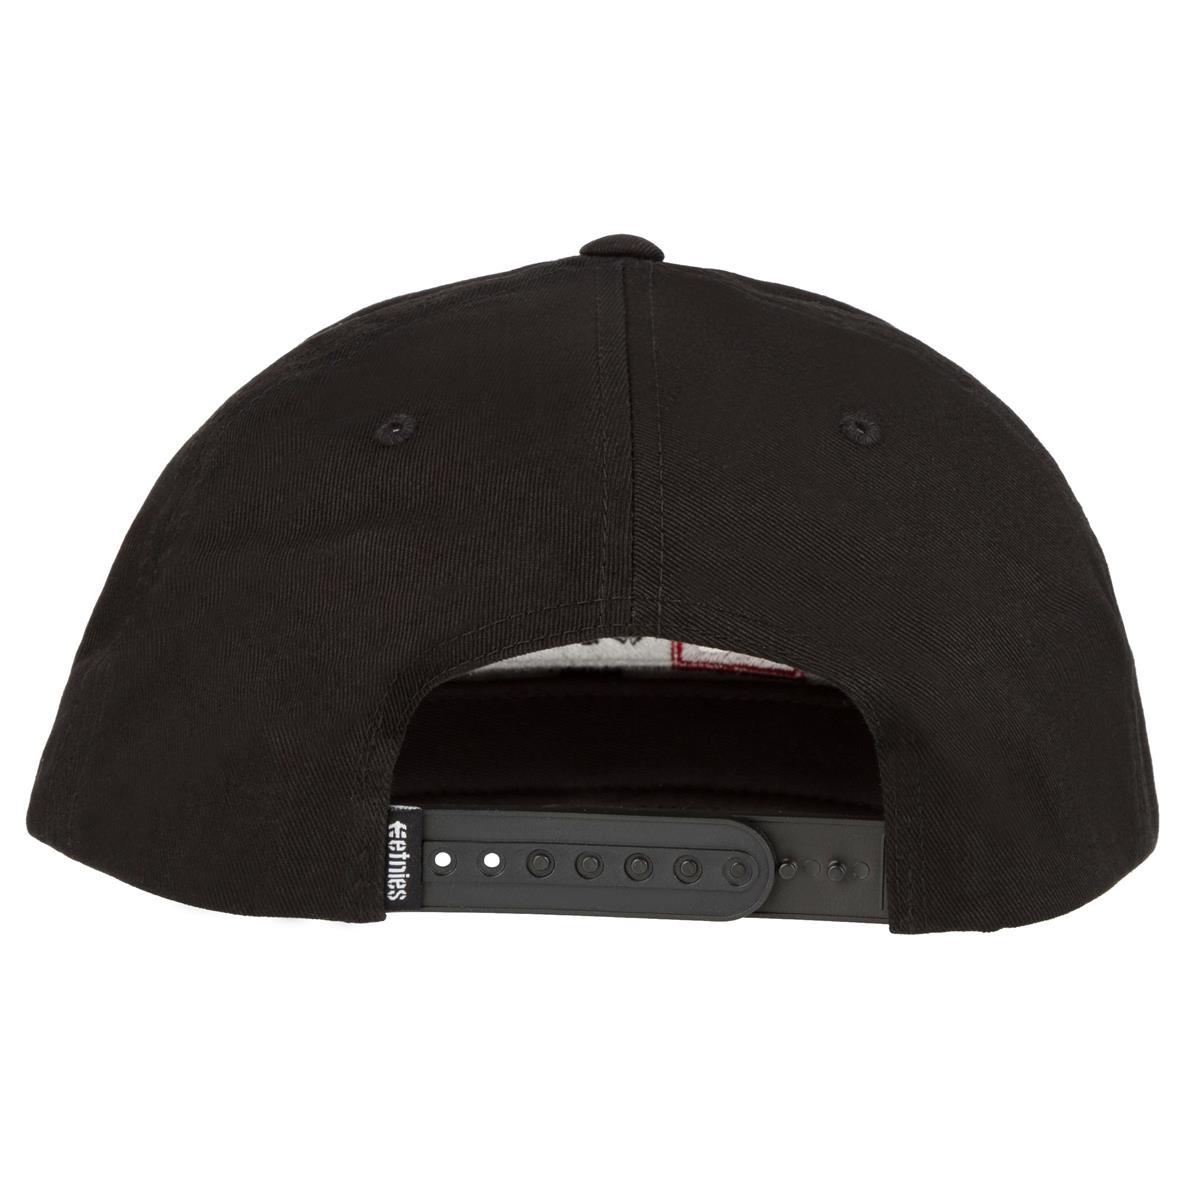 purchase cheap 5b02f 1b4ce 1. 2. PrevNext. Etnies Shop. Etnies Snapback Cap Corp Box Mix Black